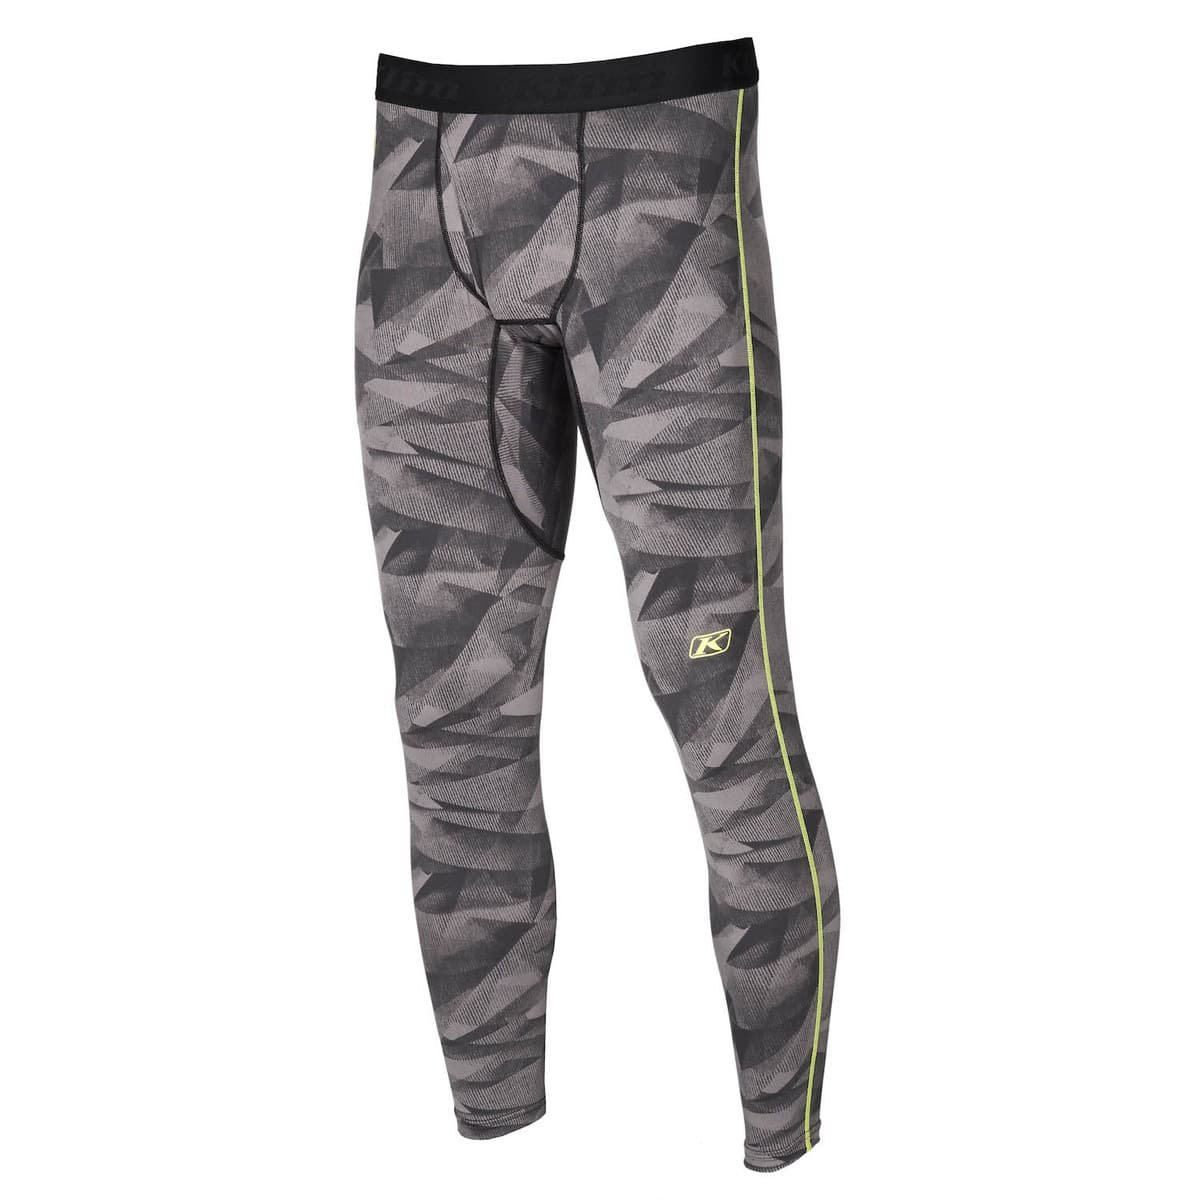 Klim Aggressor Pants 1.0 (SMALL) (GREY)